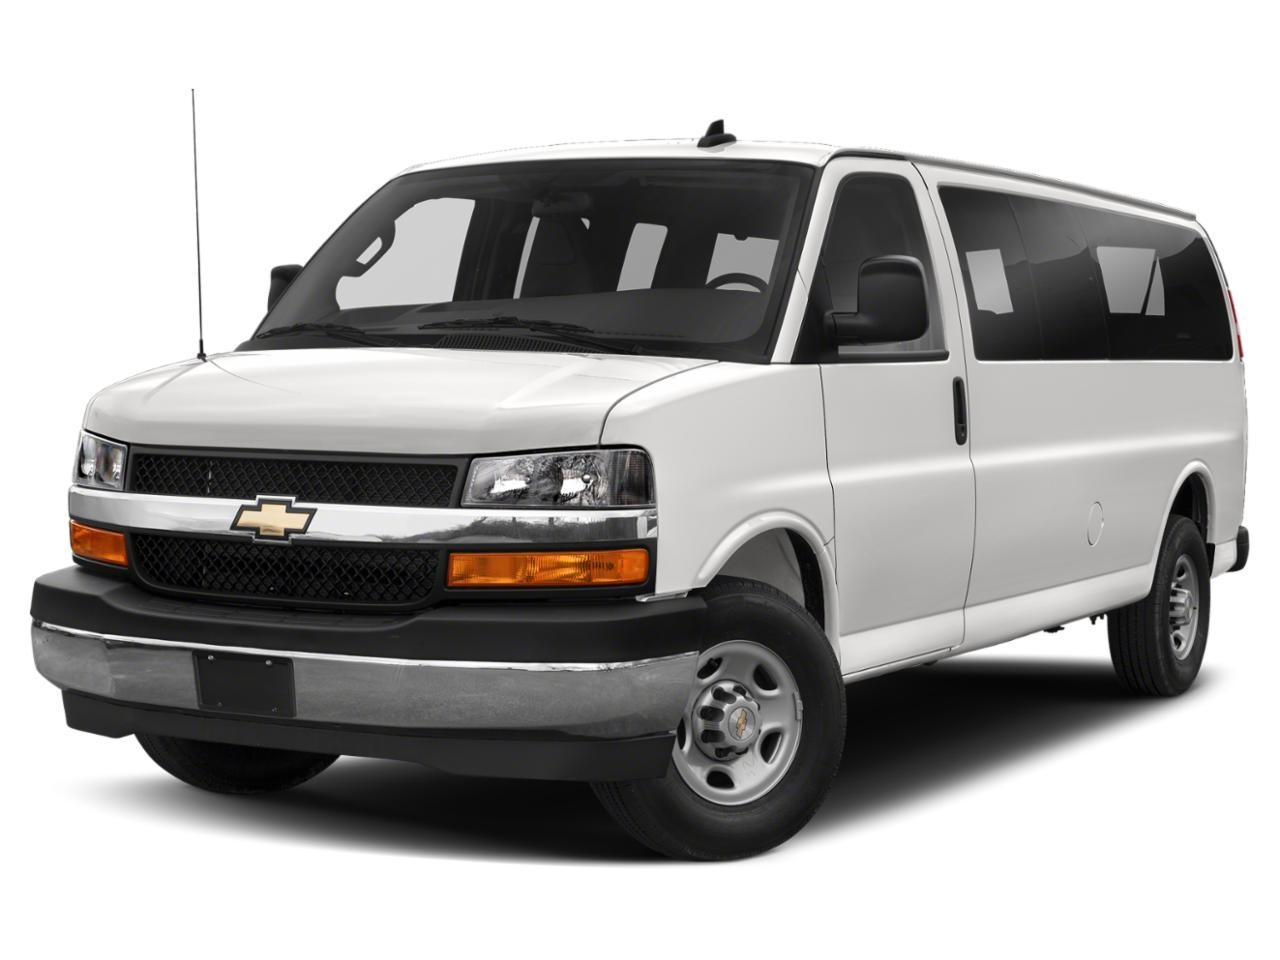 2020 Chevrolet Express Passenger Vehicle Photo in Melbourne, FL 32901